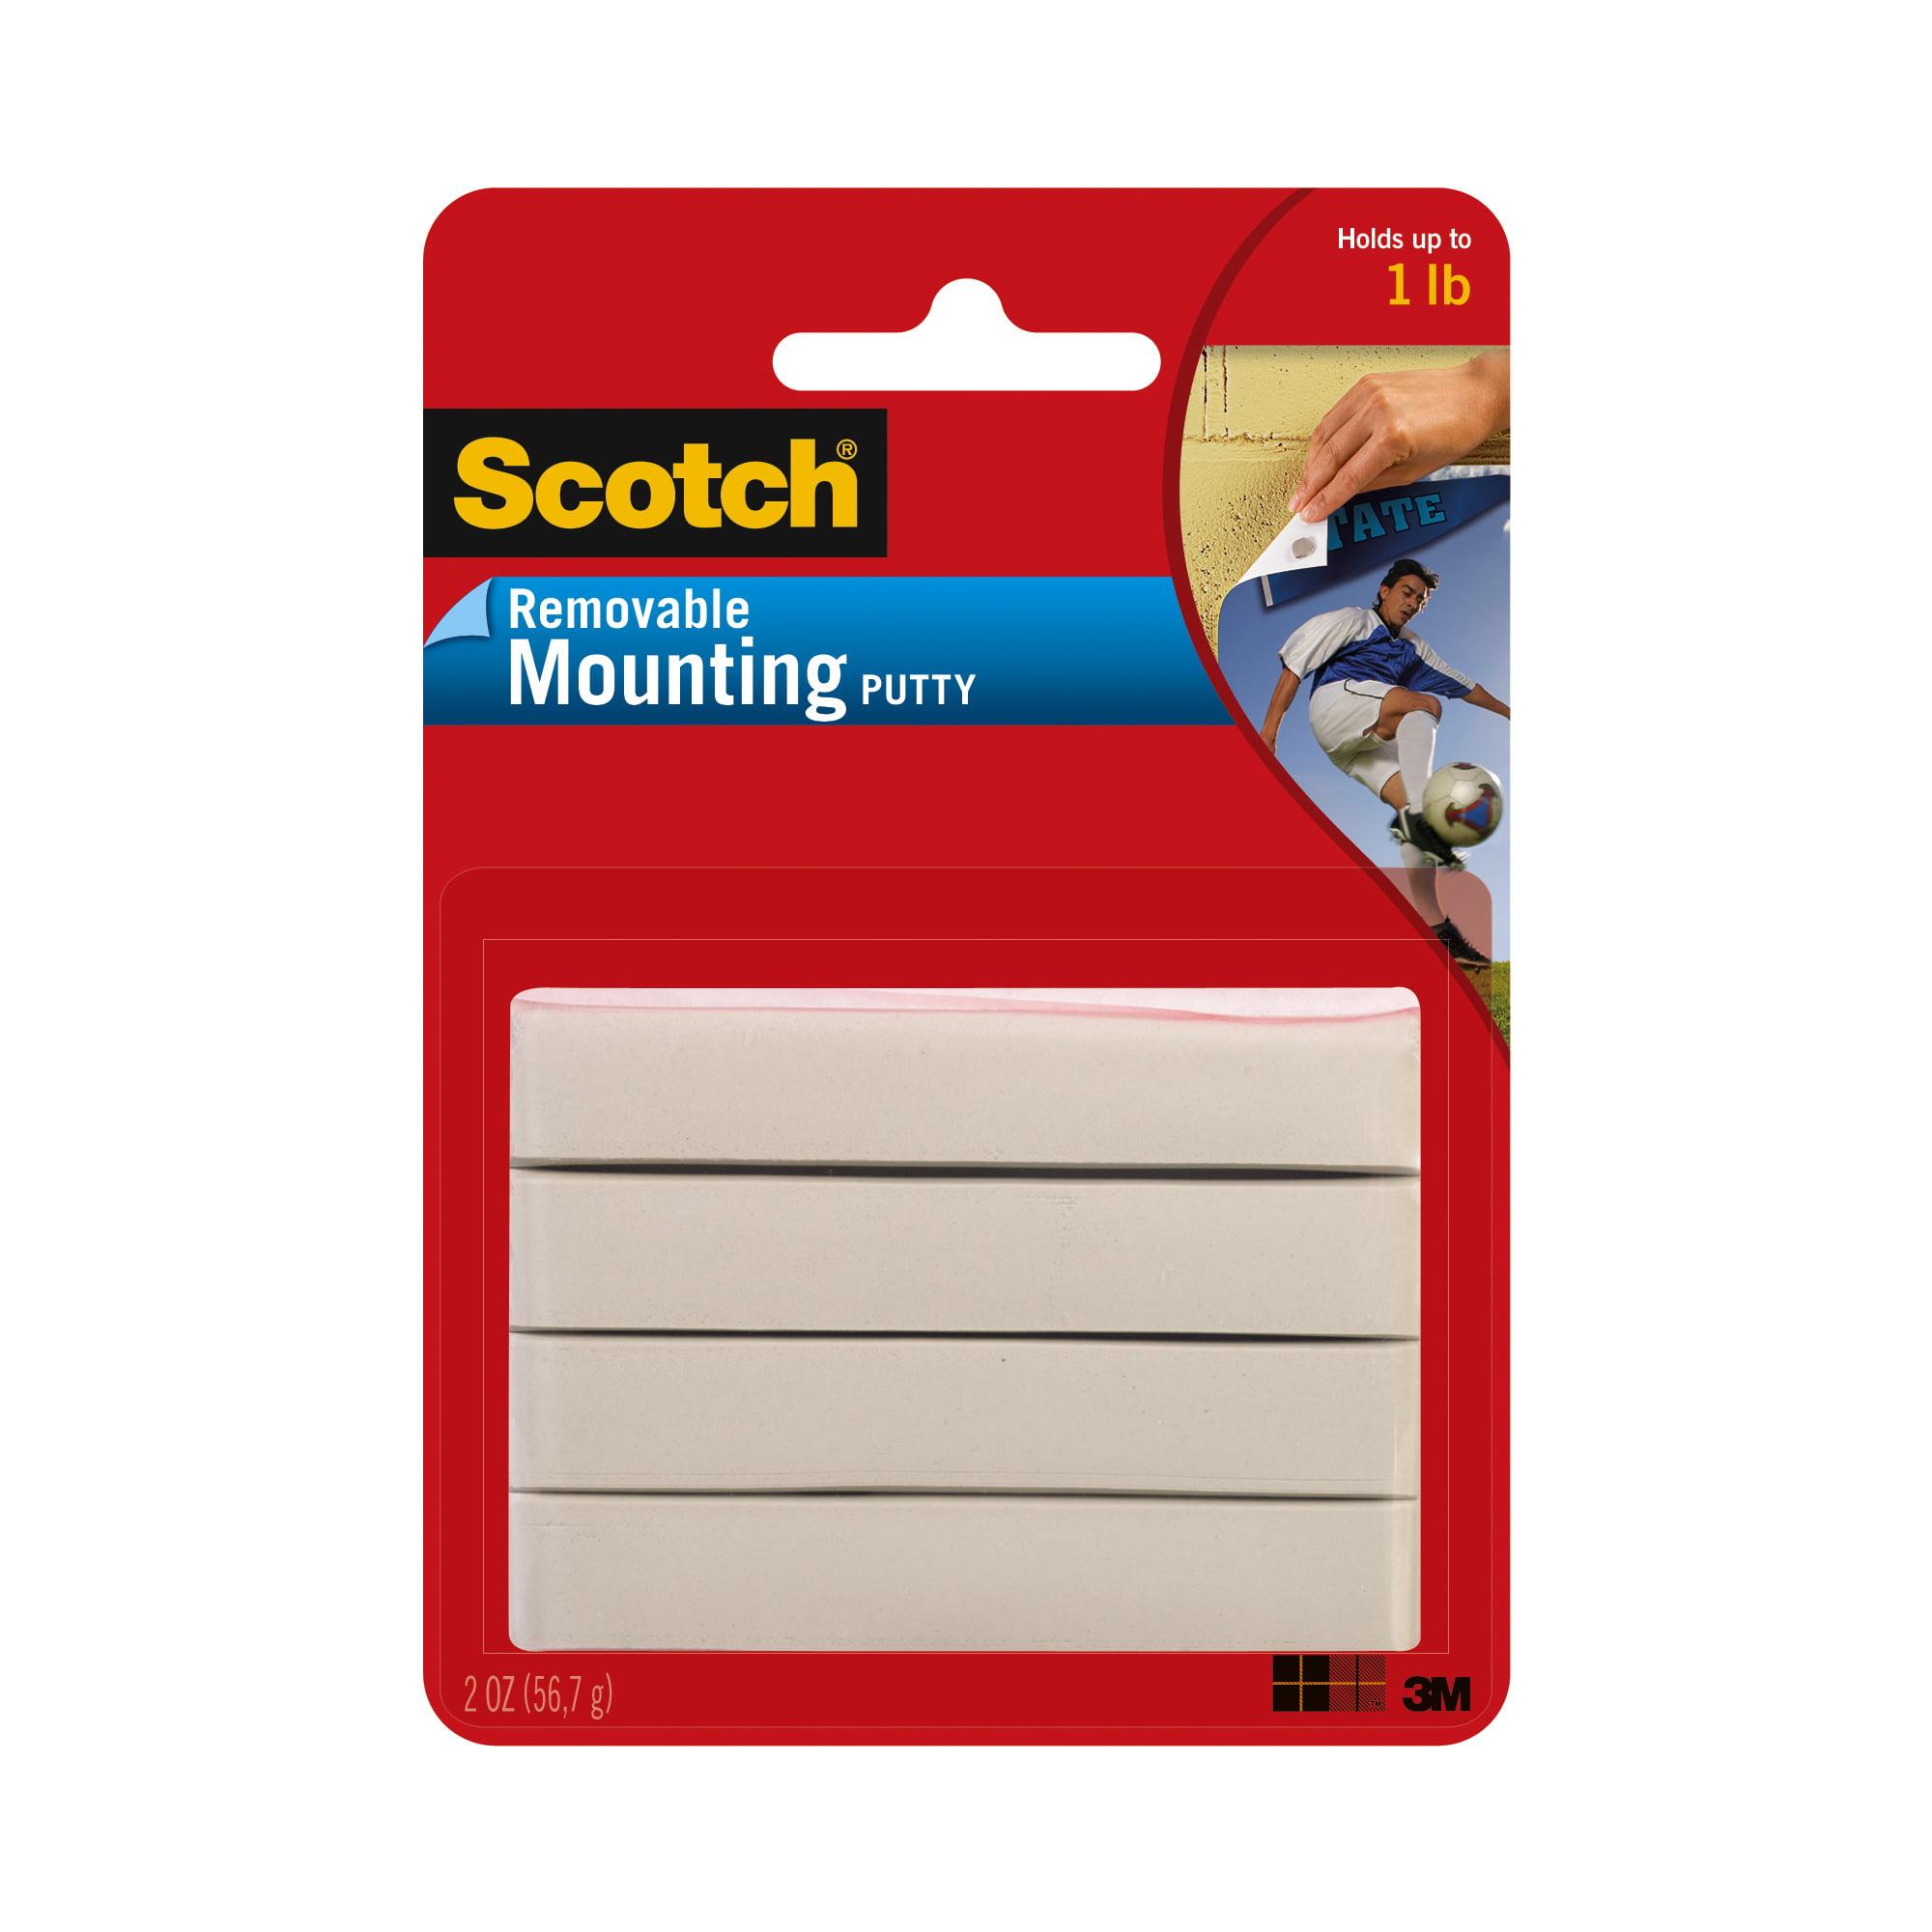 Scotch Mounting Putty, Removable 2 oz., White